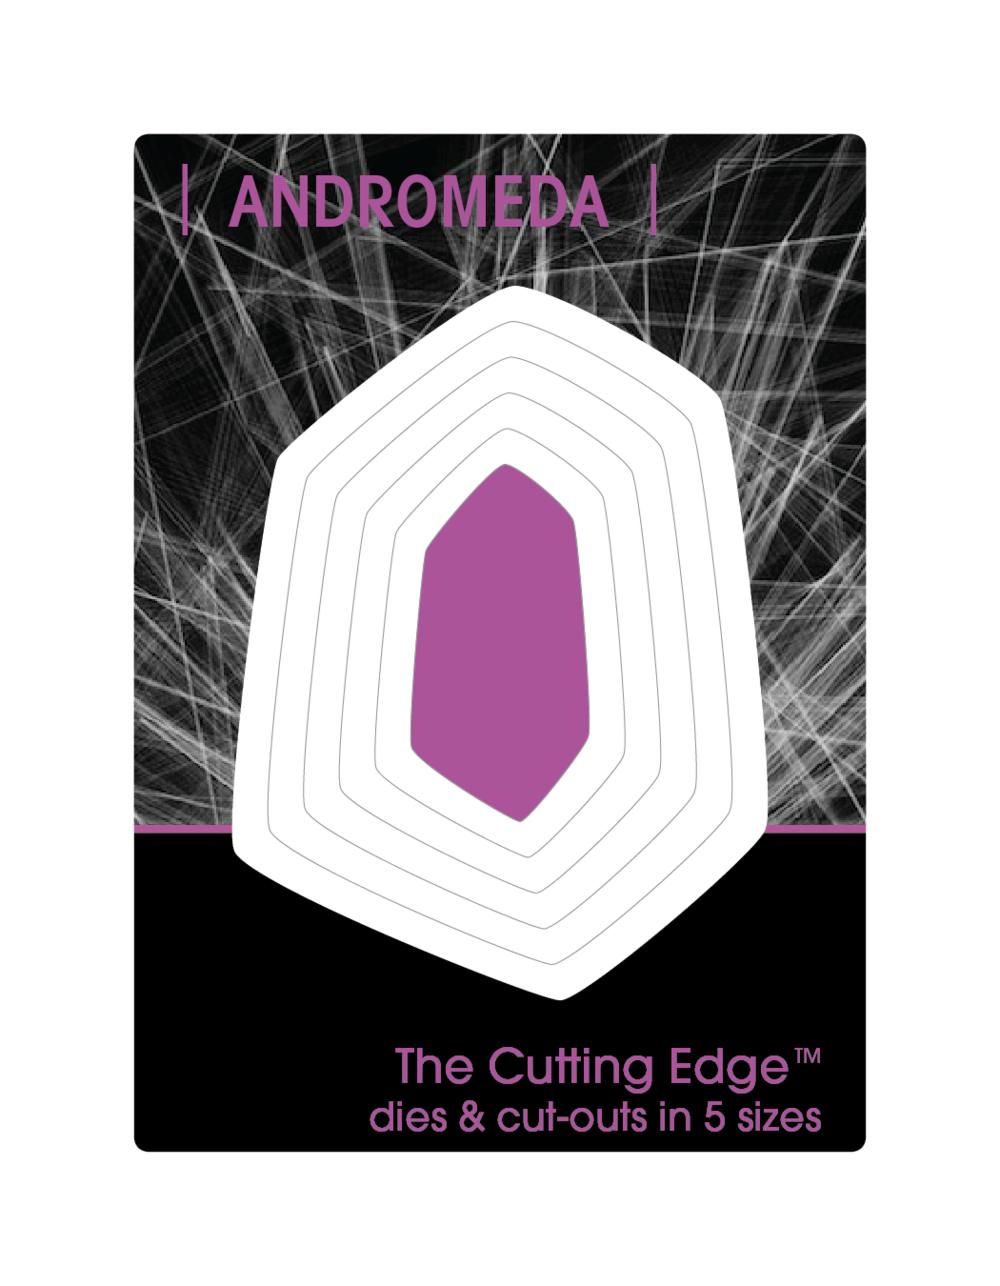 ANDROMEDA.cover.jpg